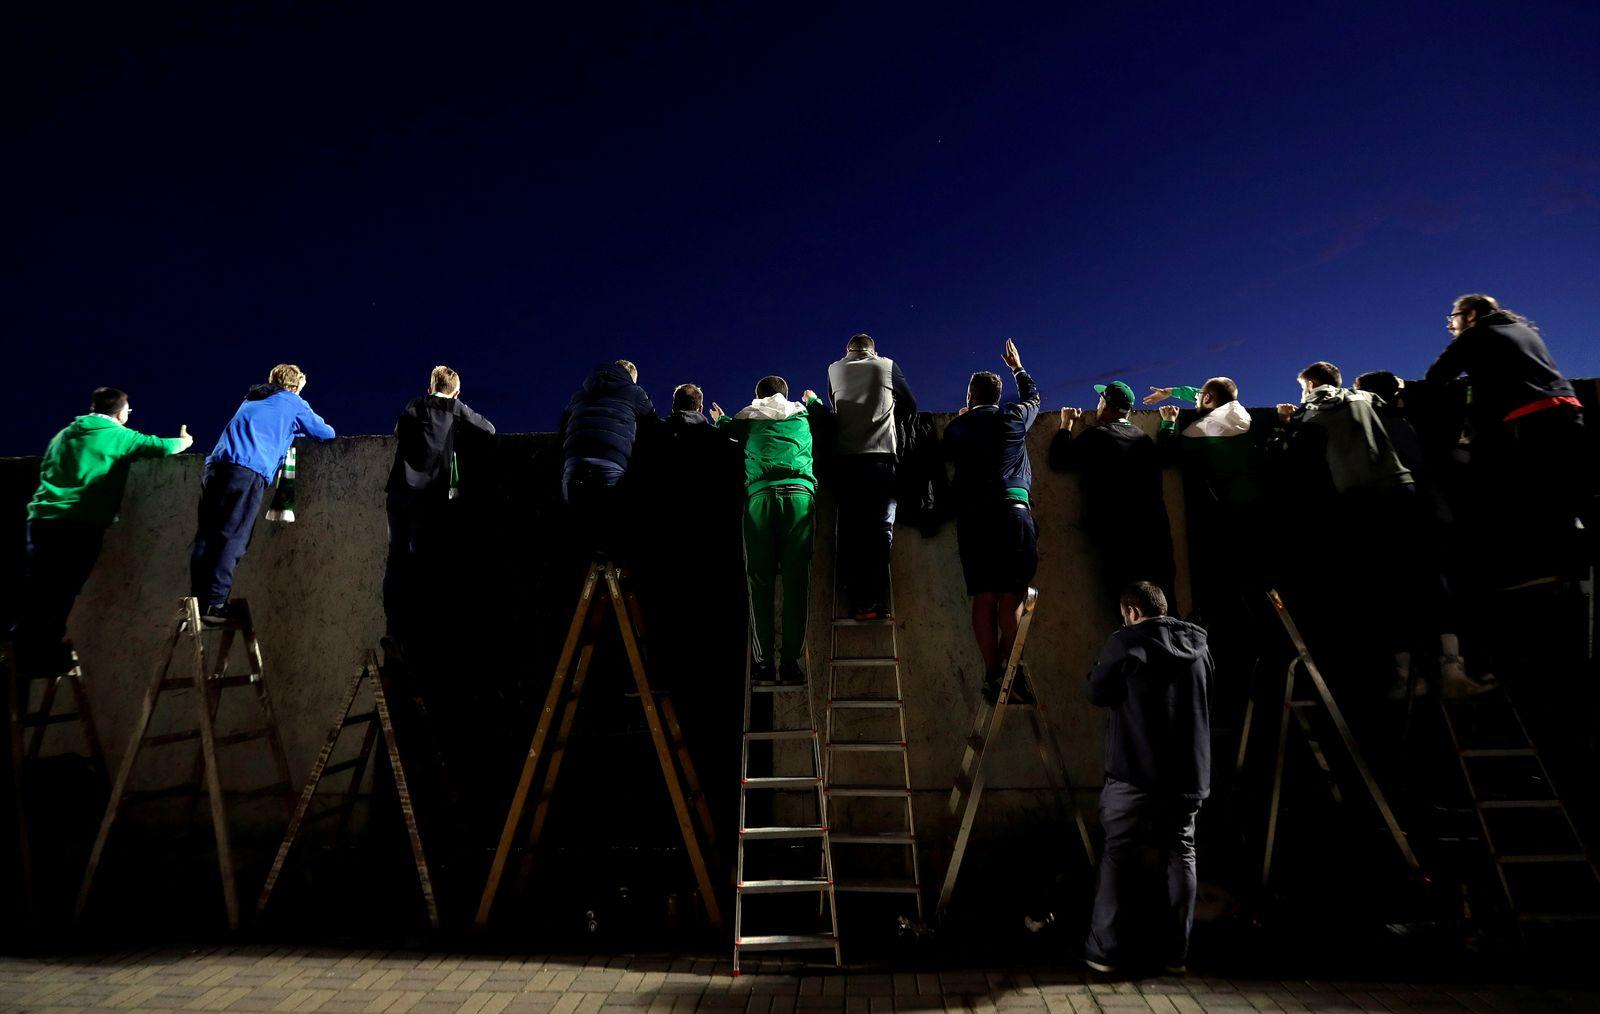 Fans watch a soccer match from behind a wall in Prague